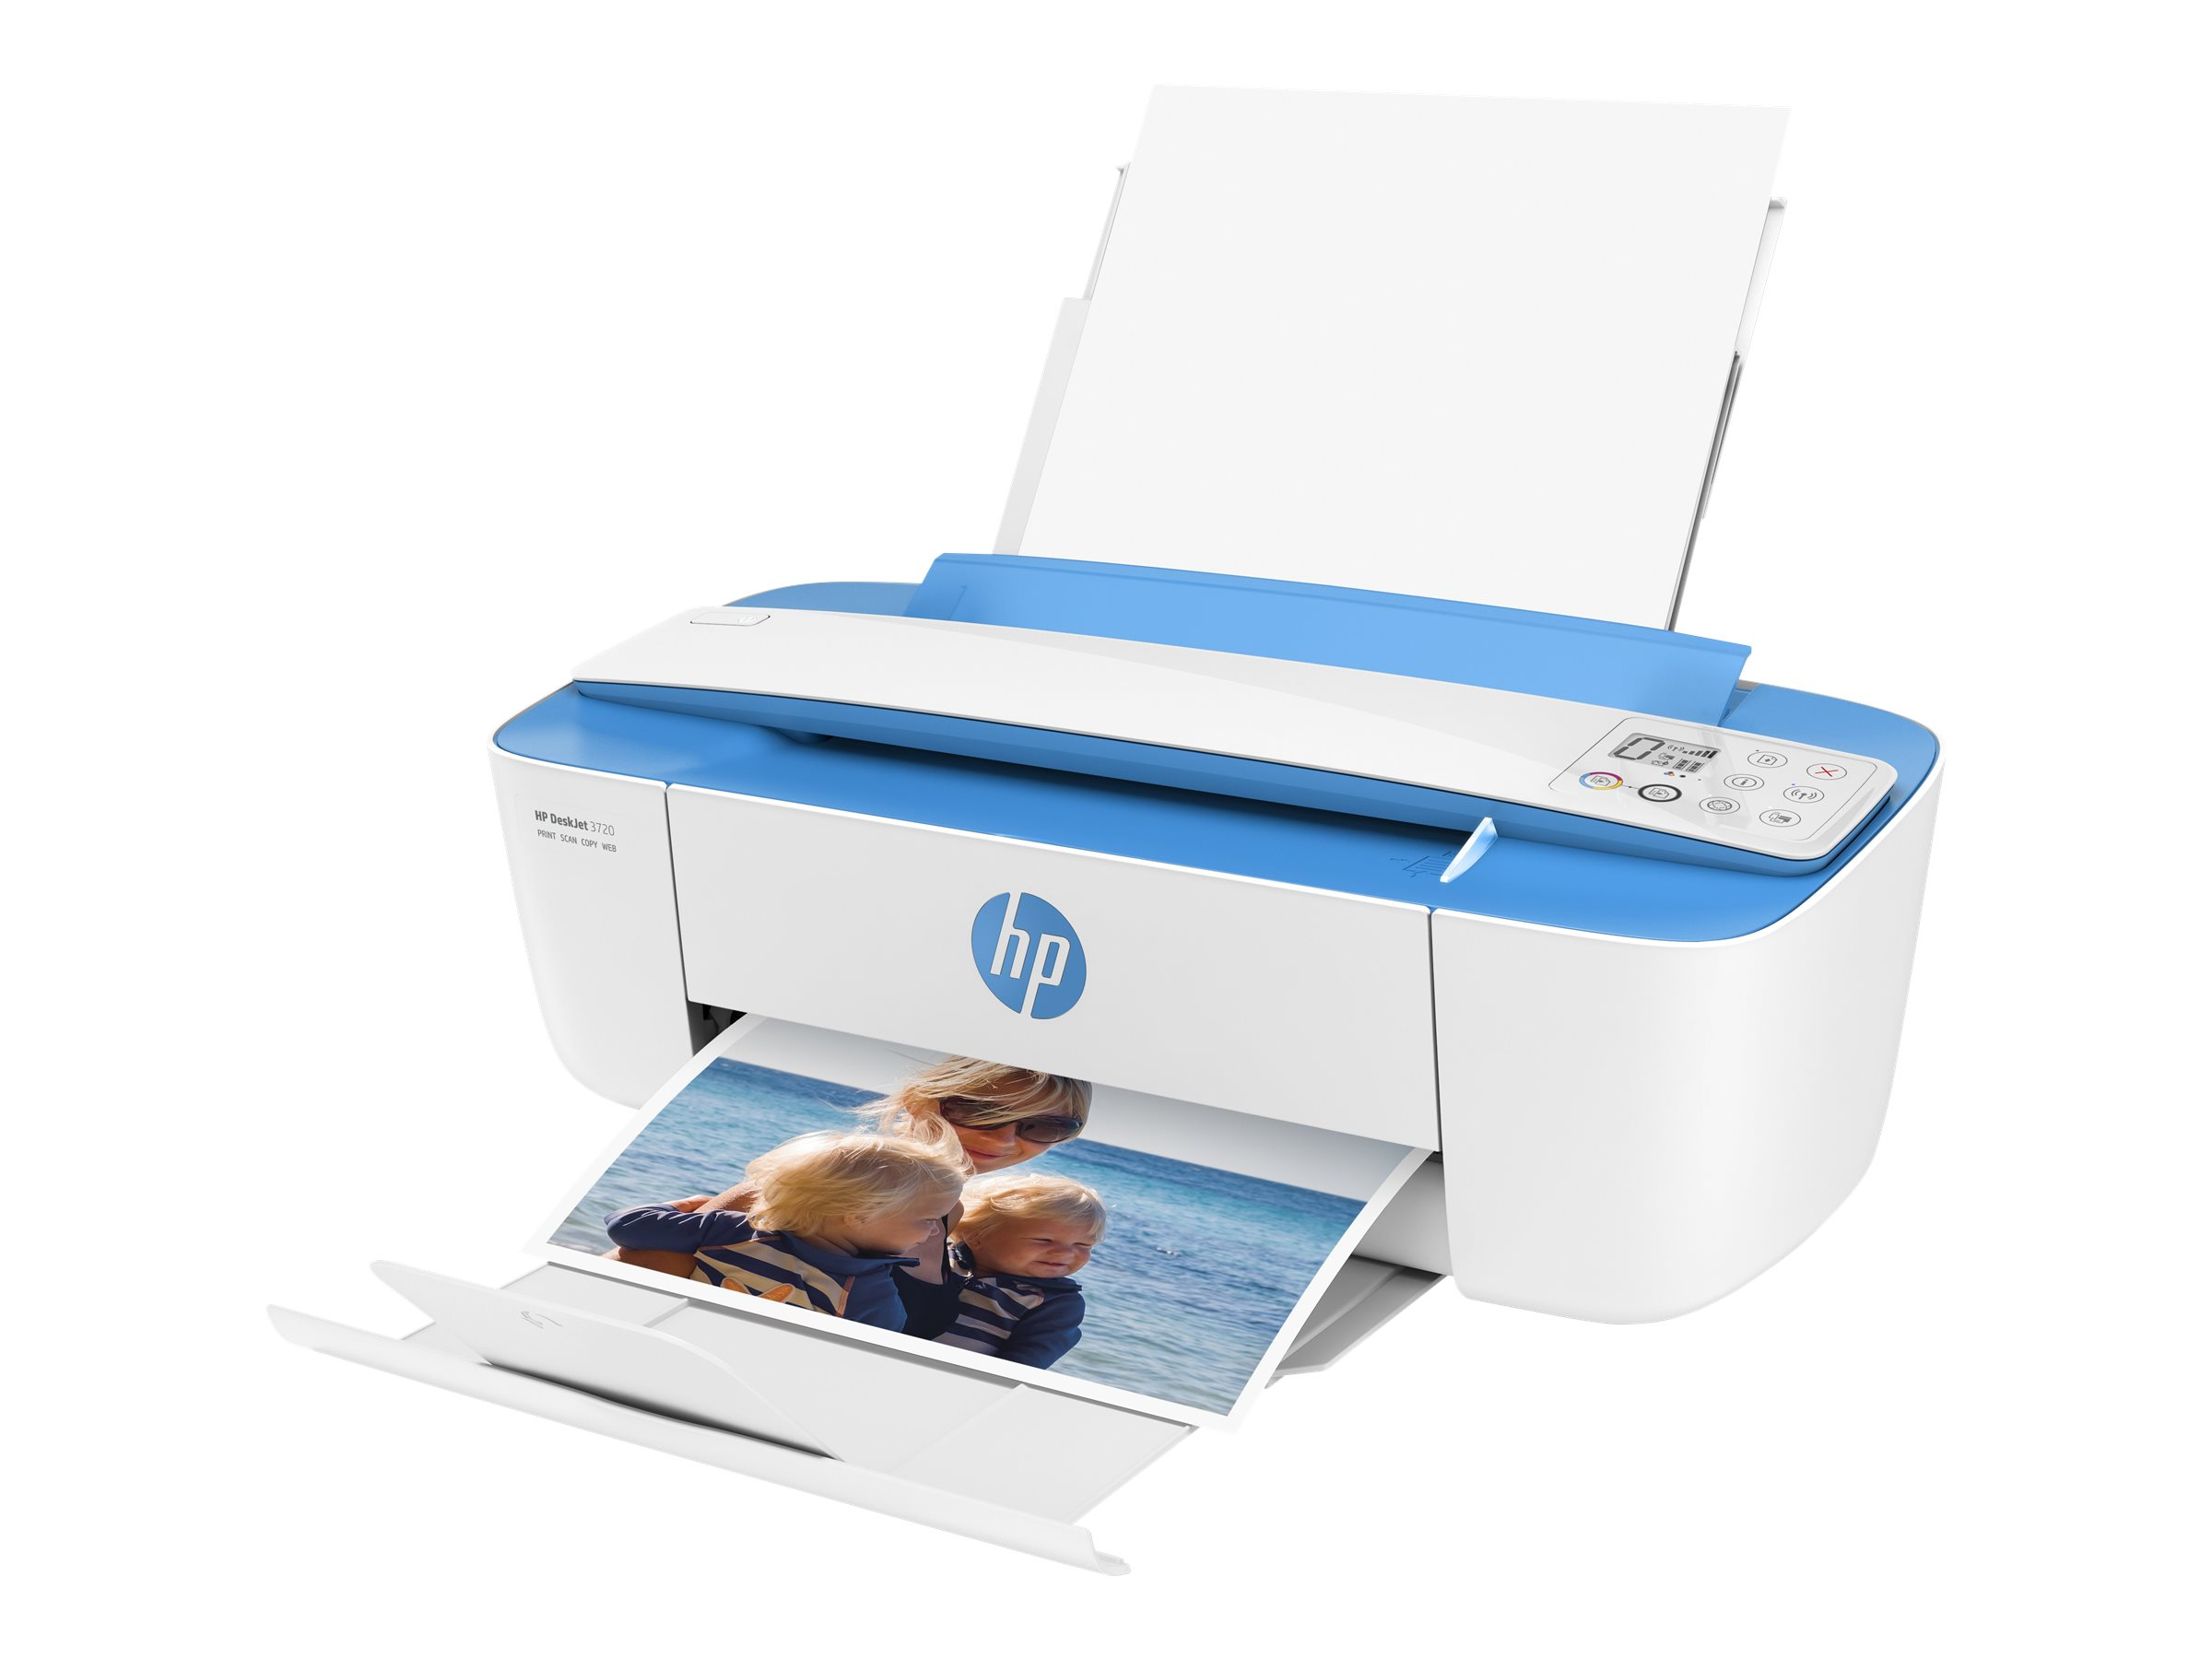 HP Deskjet 3732 All-in-One - Multifunktionsdrucker - Farbe - Tintenstrahl - 216 x 355 mm (Original) - A4/Legal (Medien)